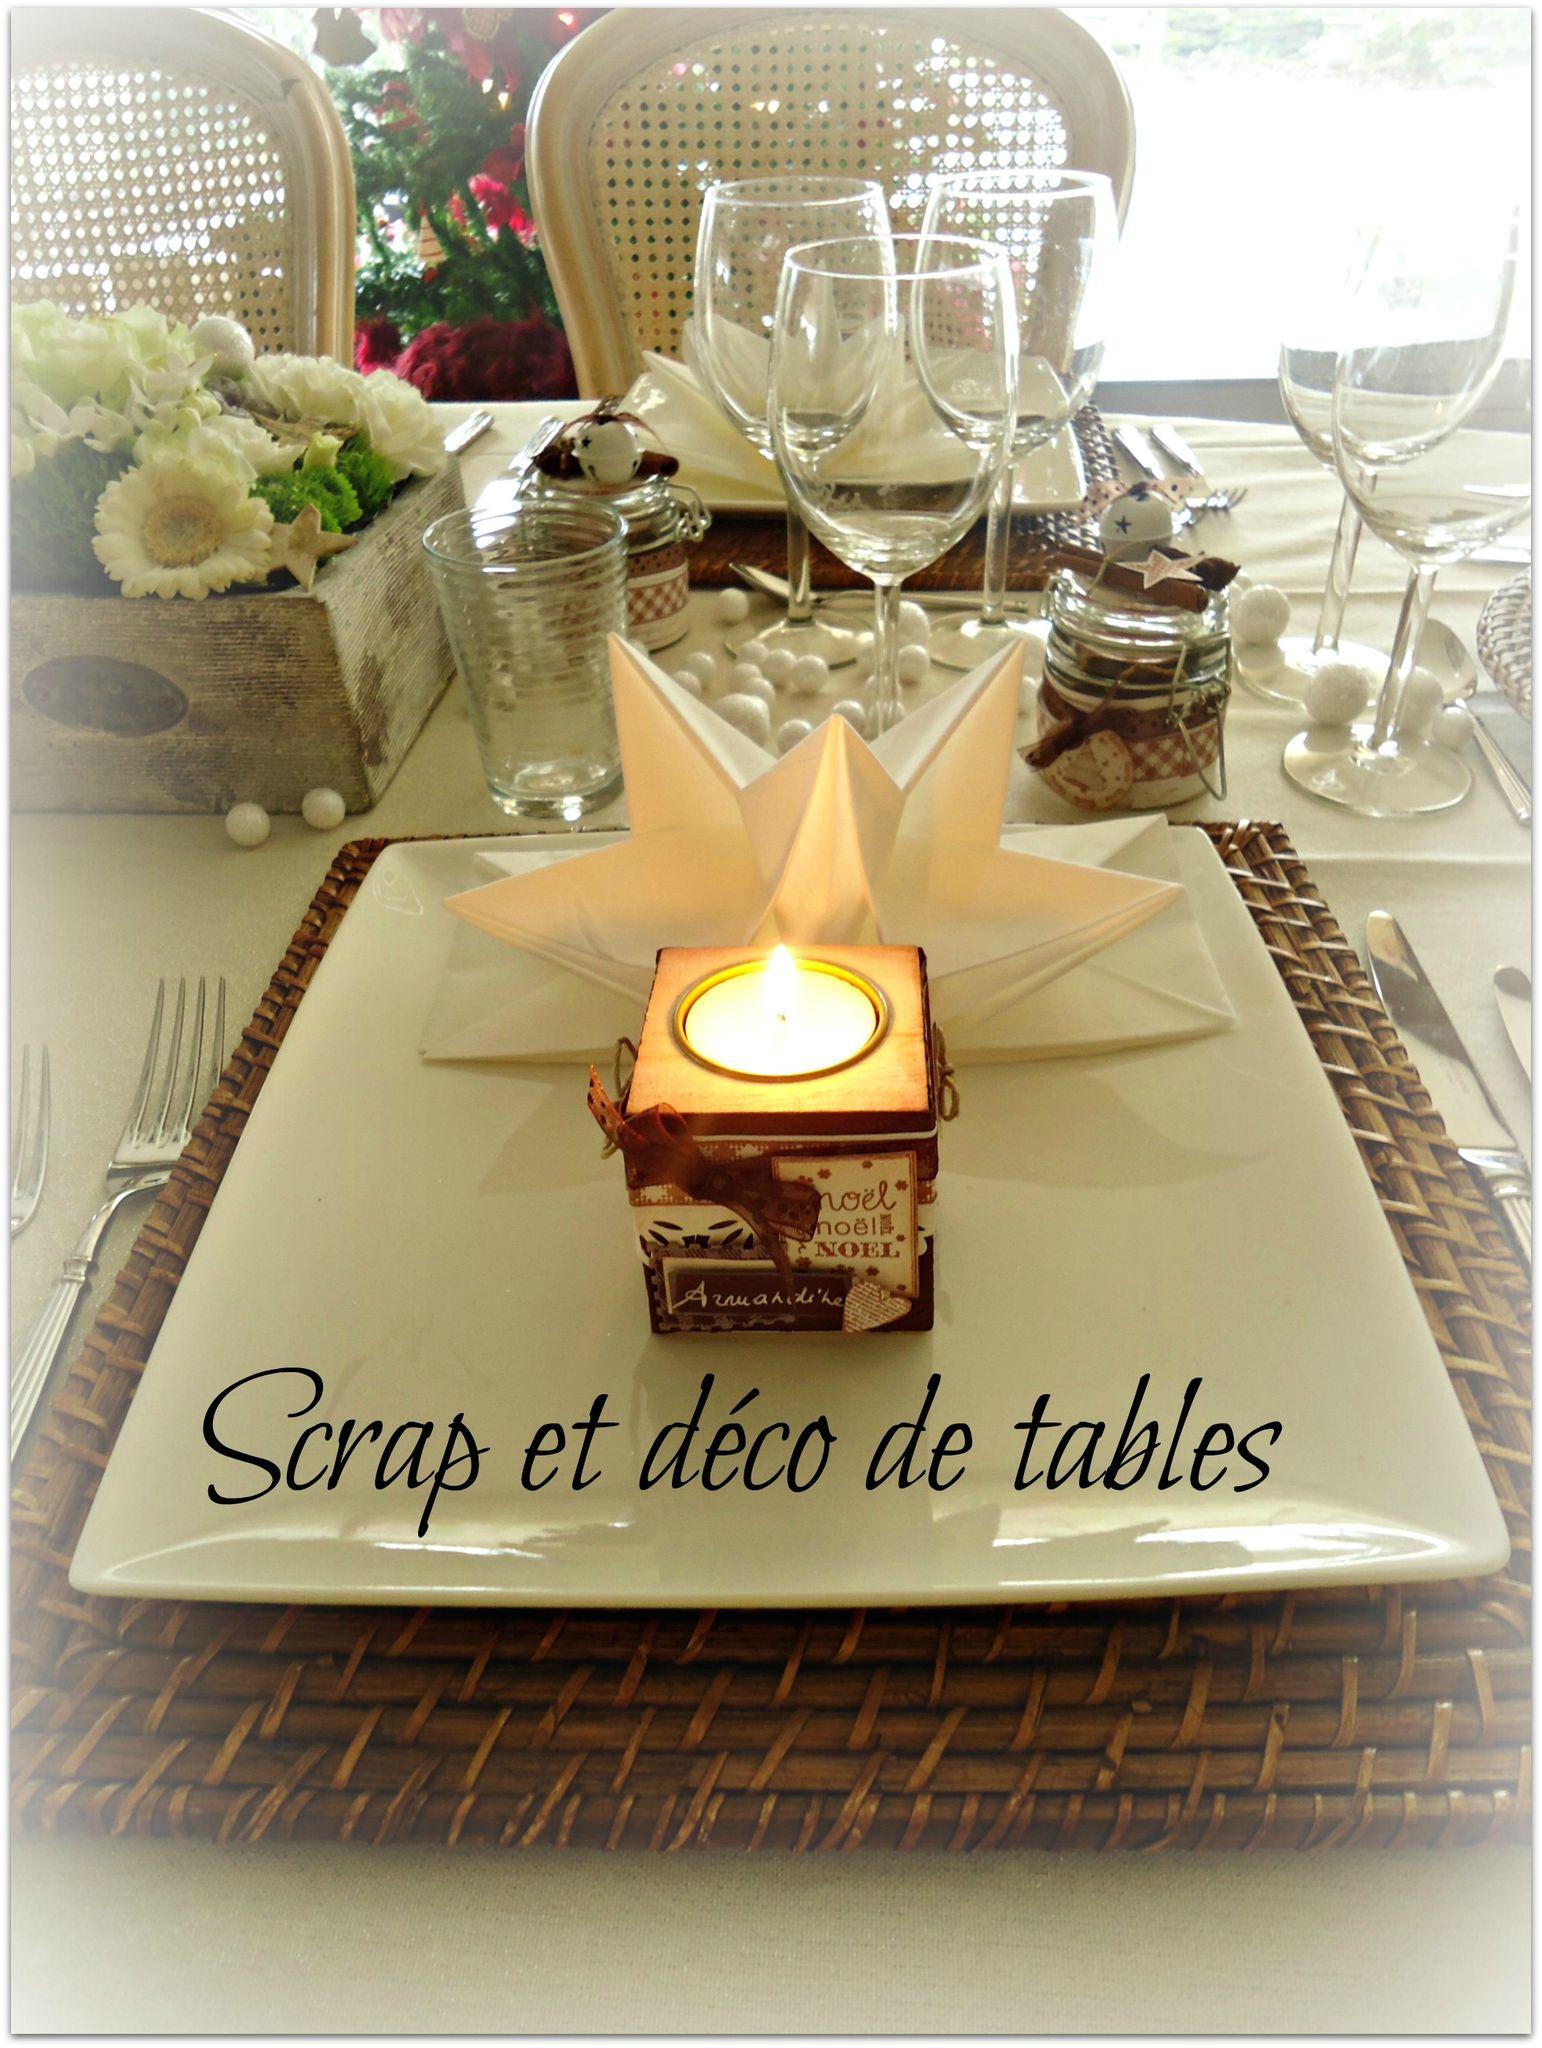 #C0960B DECO DE TABLE DE NOËL BLANC/BRUN Scrap Et Déco De Tables 6185 decoration de table de noel en scrap 1542x2048 px @ aertt.com